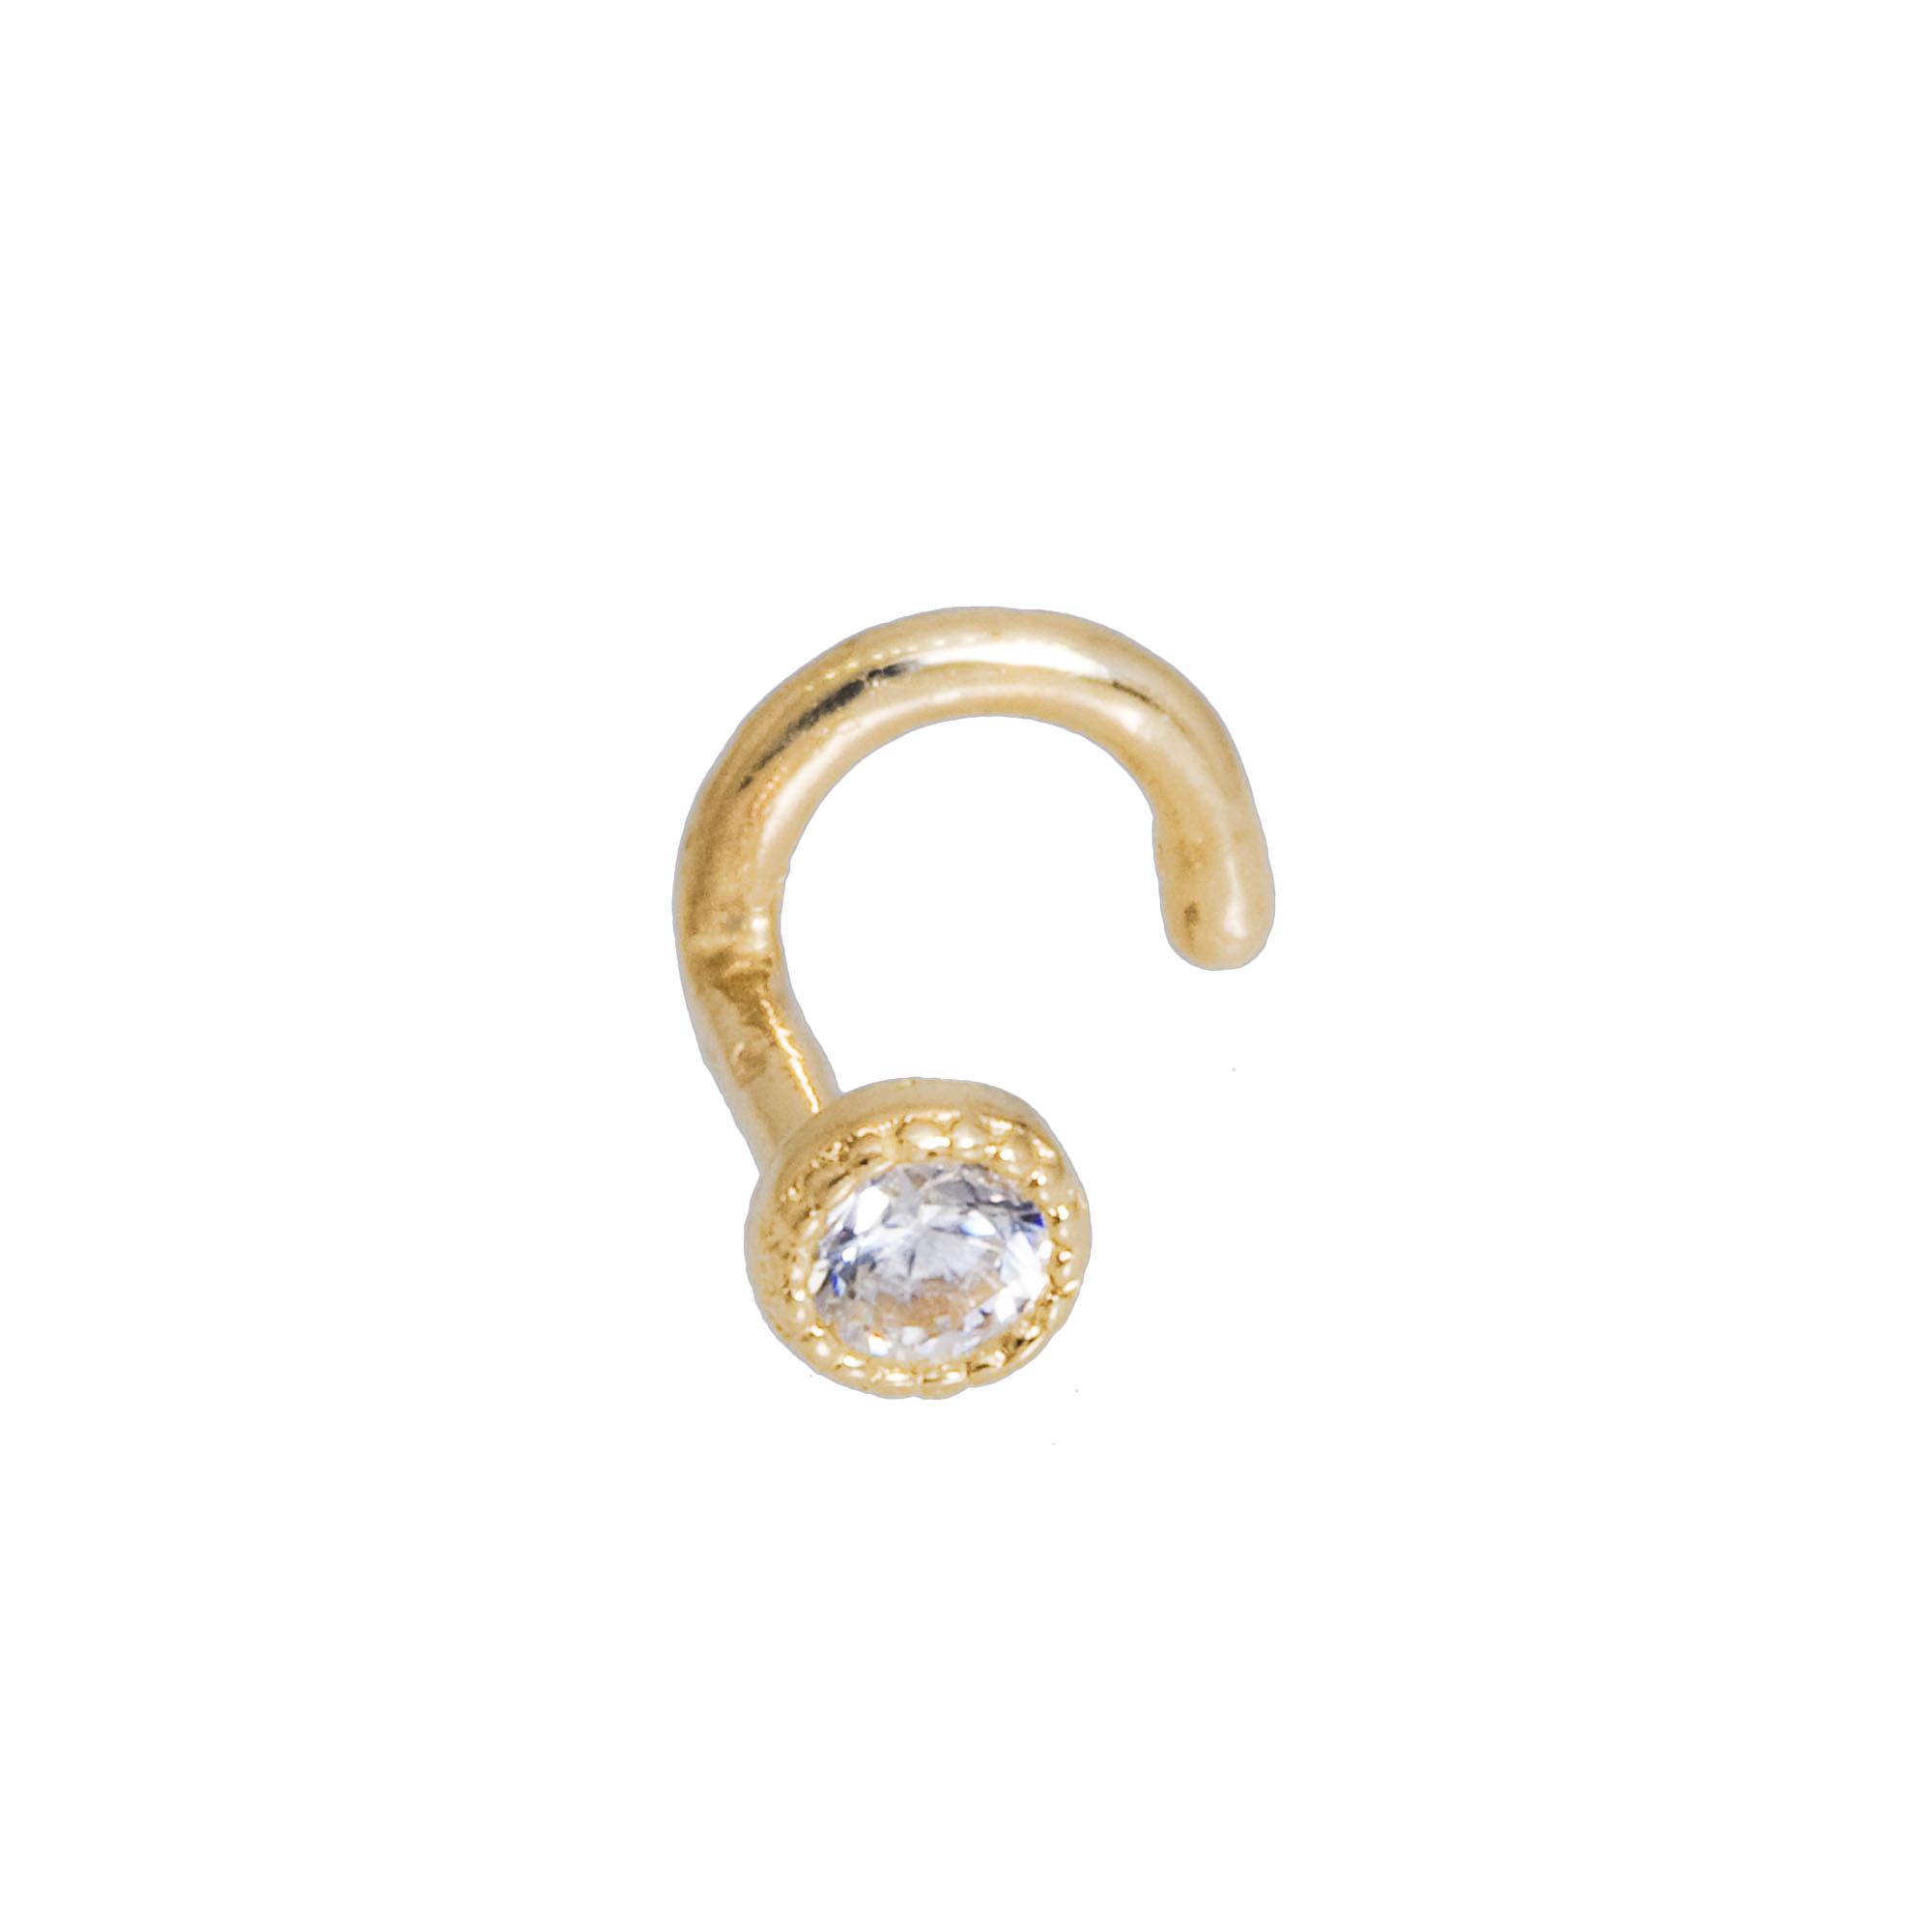 CZ 1.2mm Pettite Heart Nose Piercing in 14k Yellow Gold